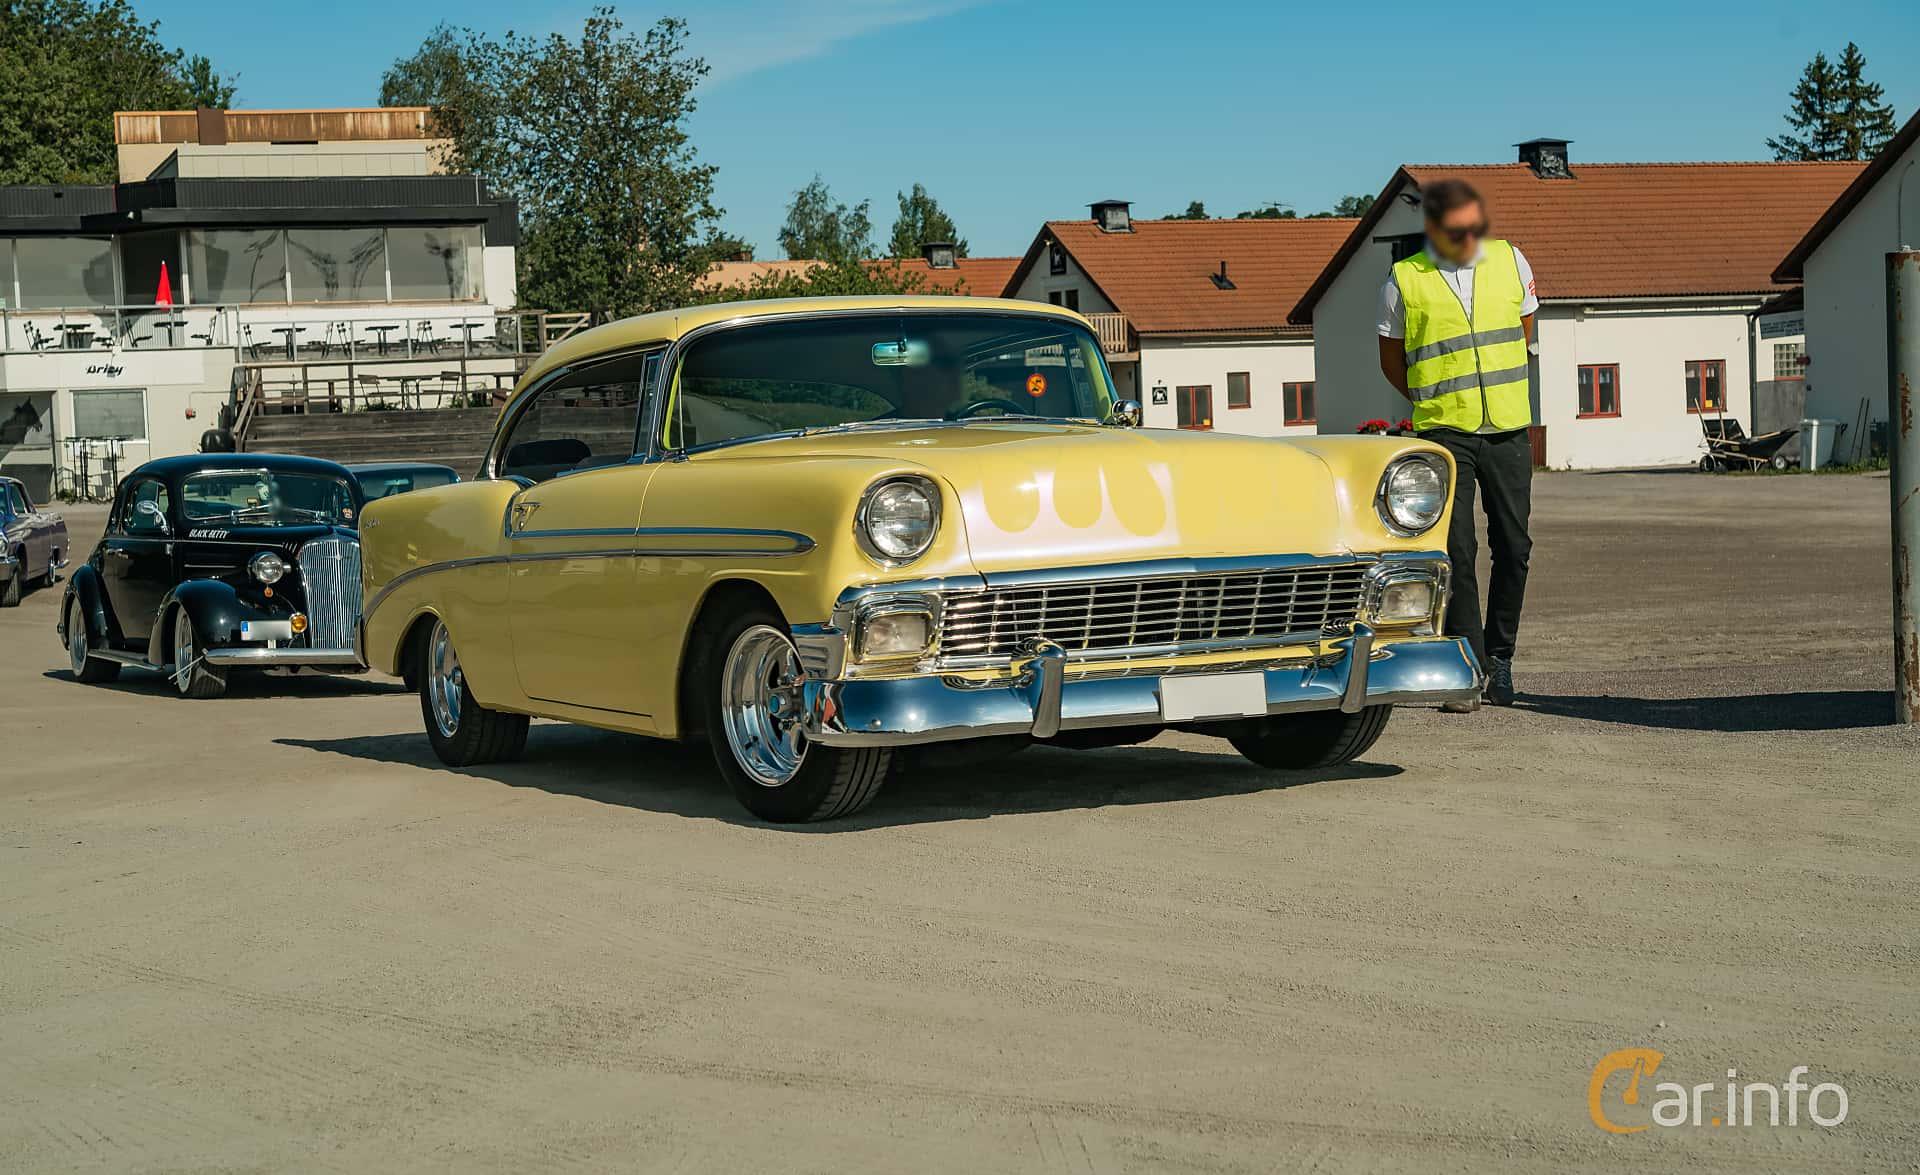 Chevrolet Bel Air Sport Coupé 4.3 V8 Powerglide, 228hp, 1956 at Stockholm Vintage & Sports Car meet 2019